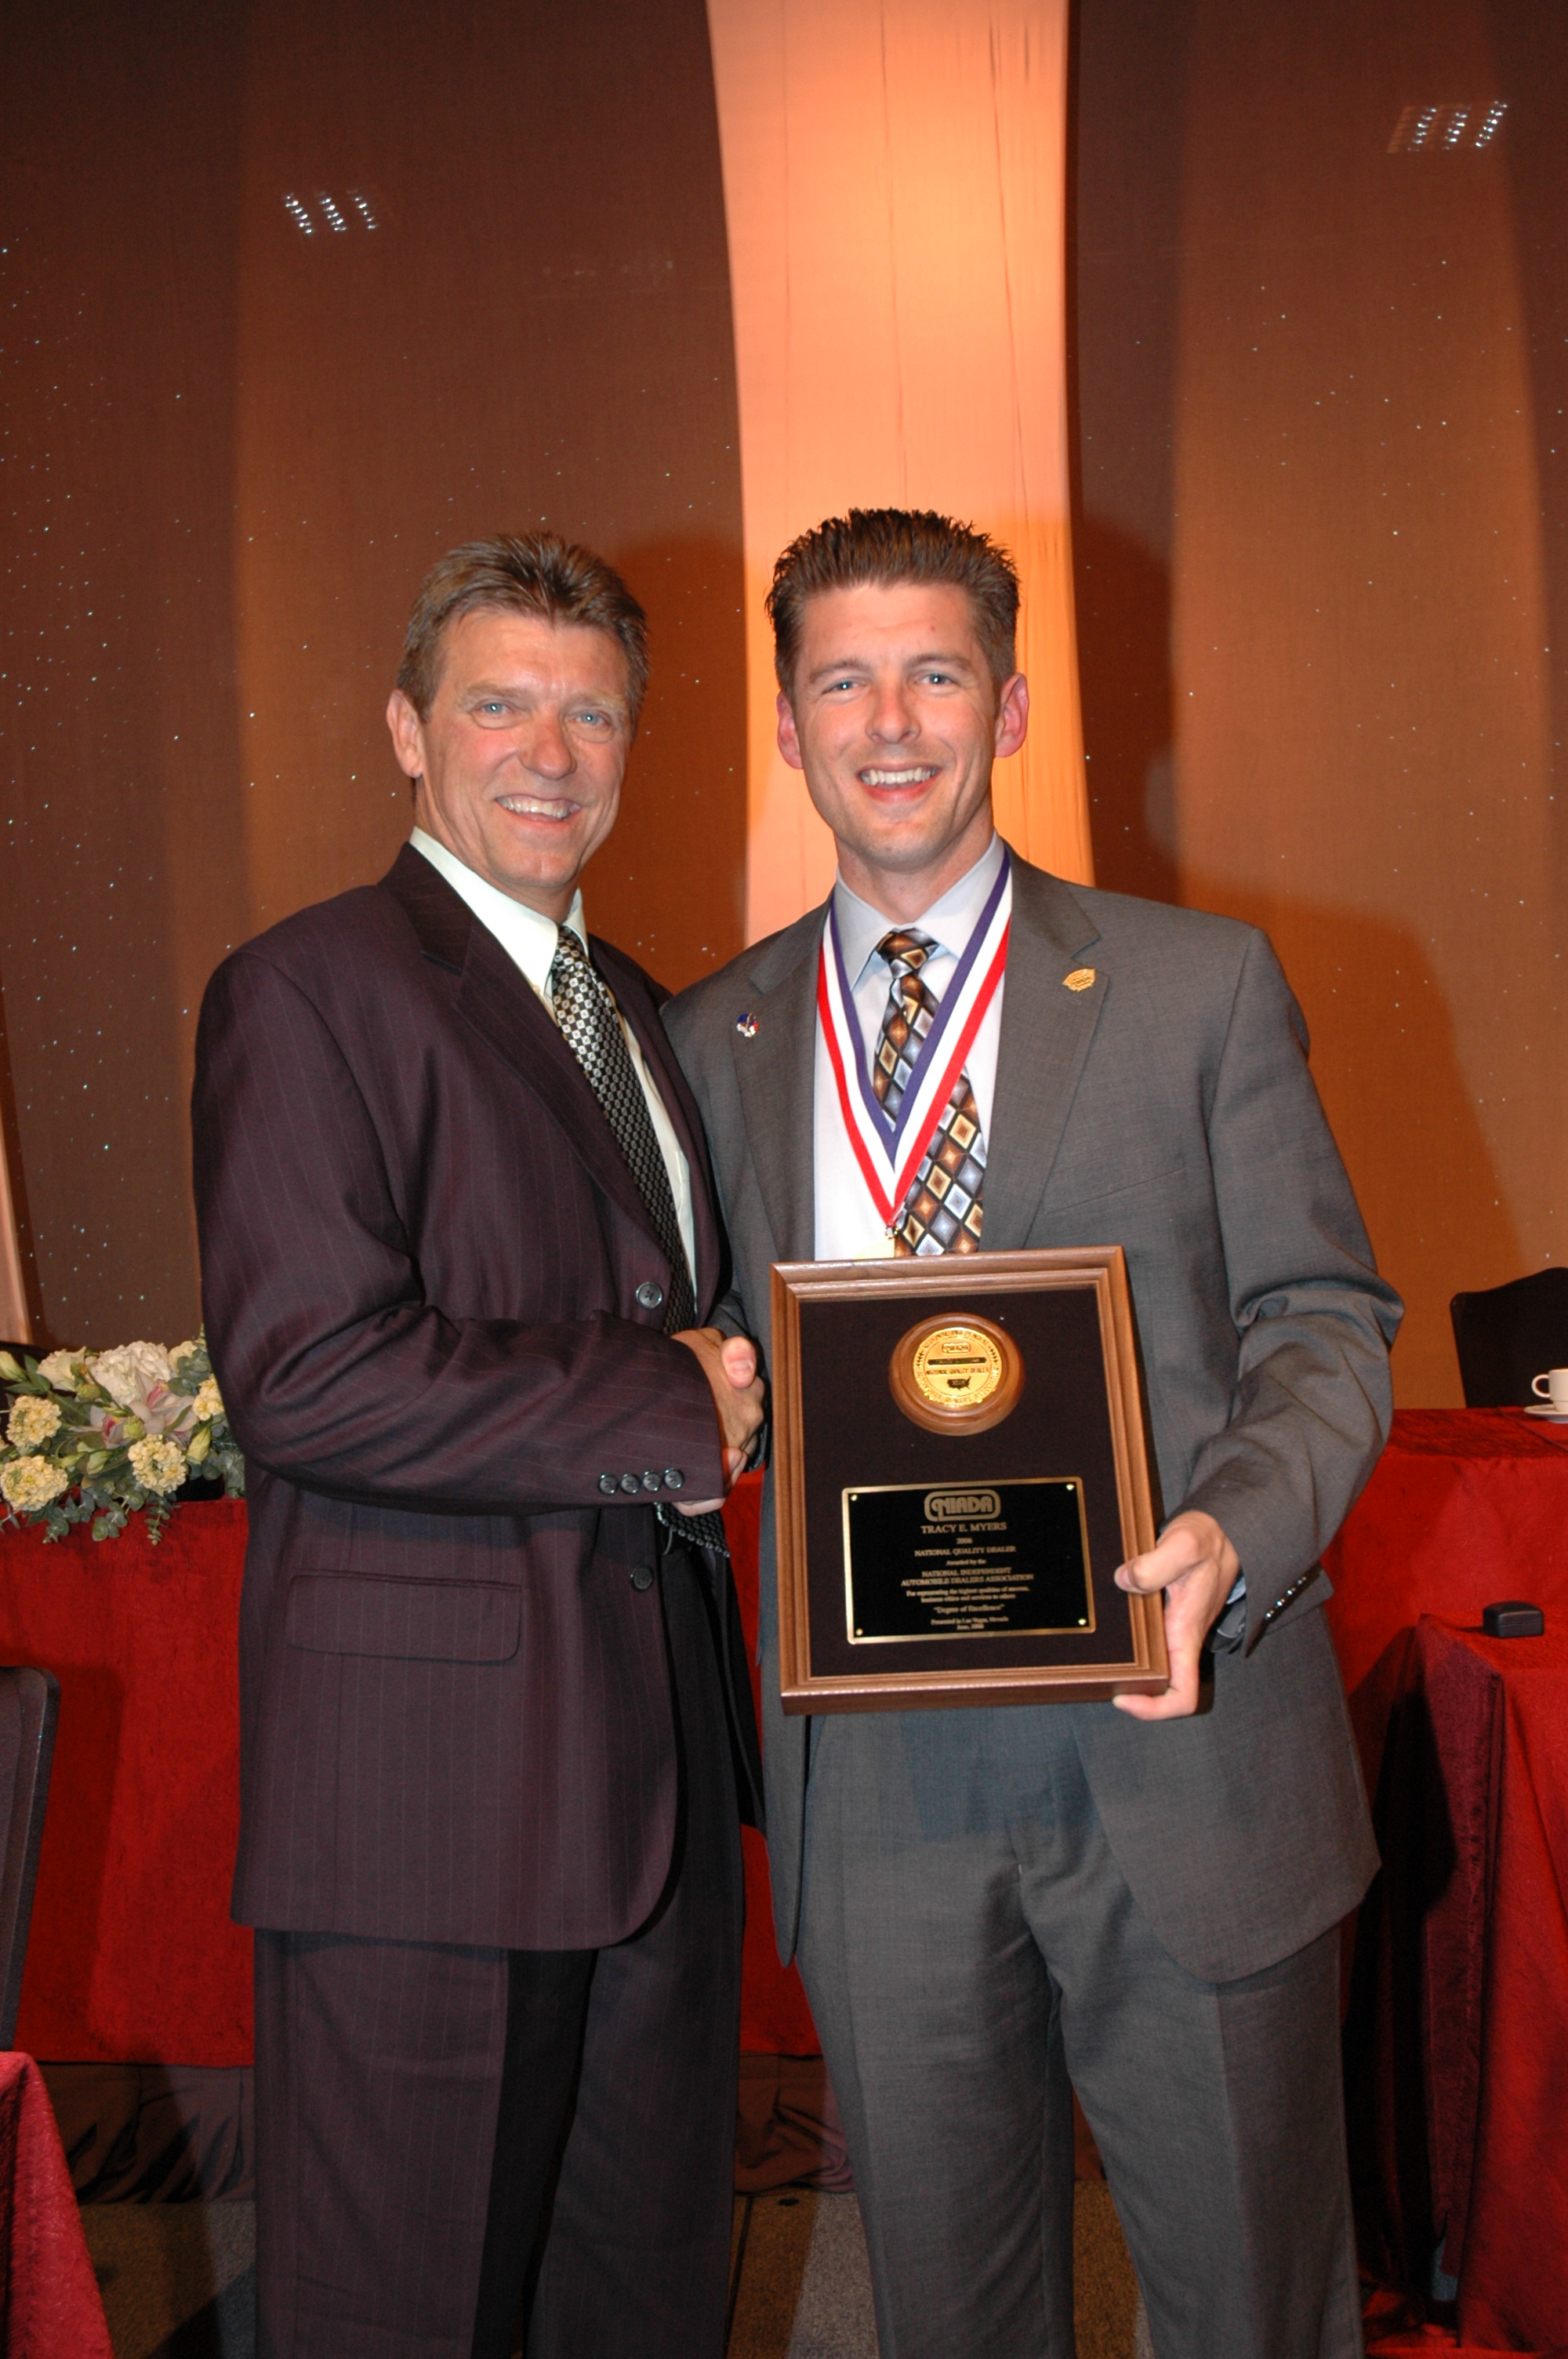 NQD Award 2006